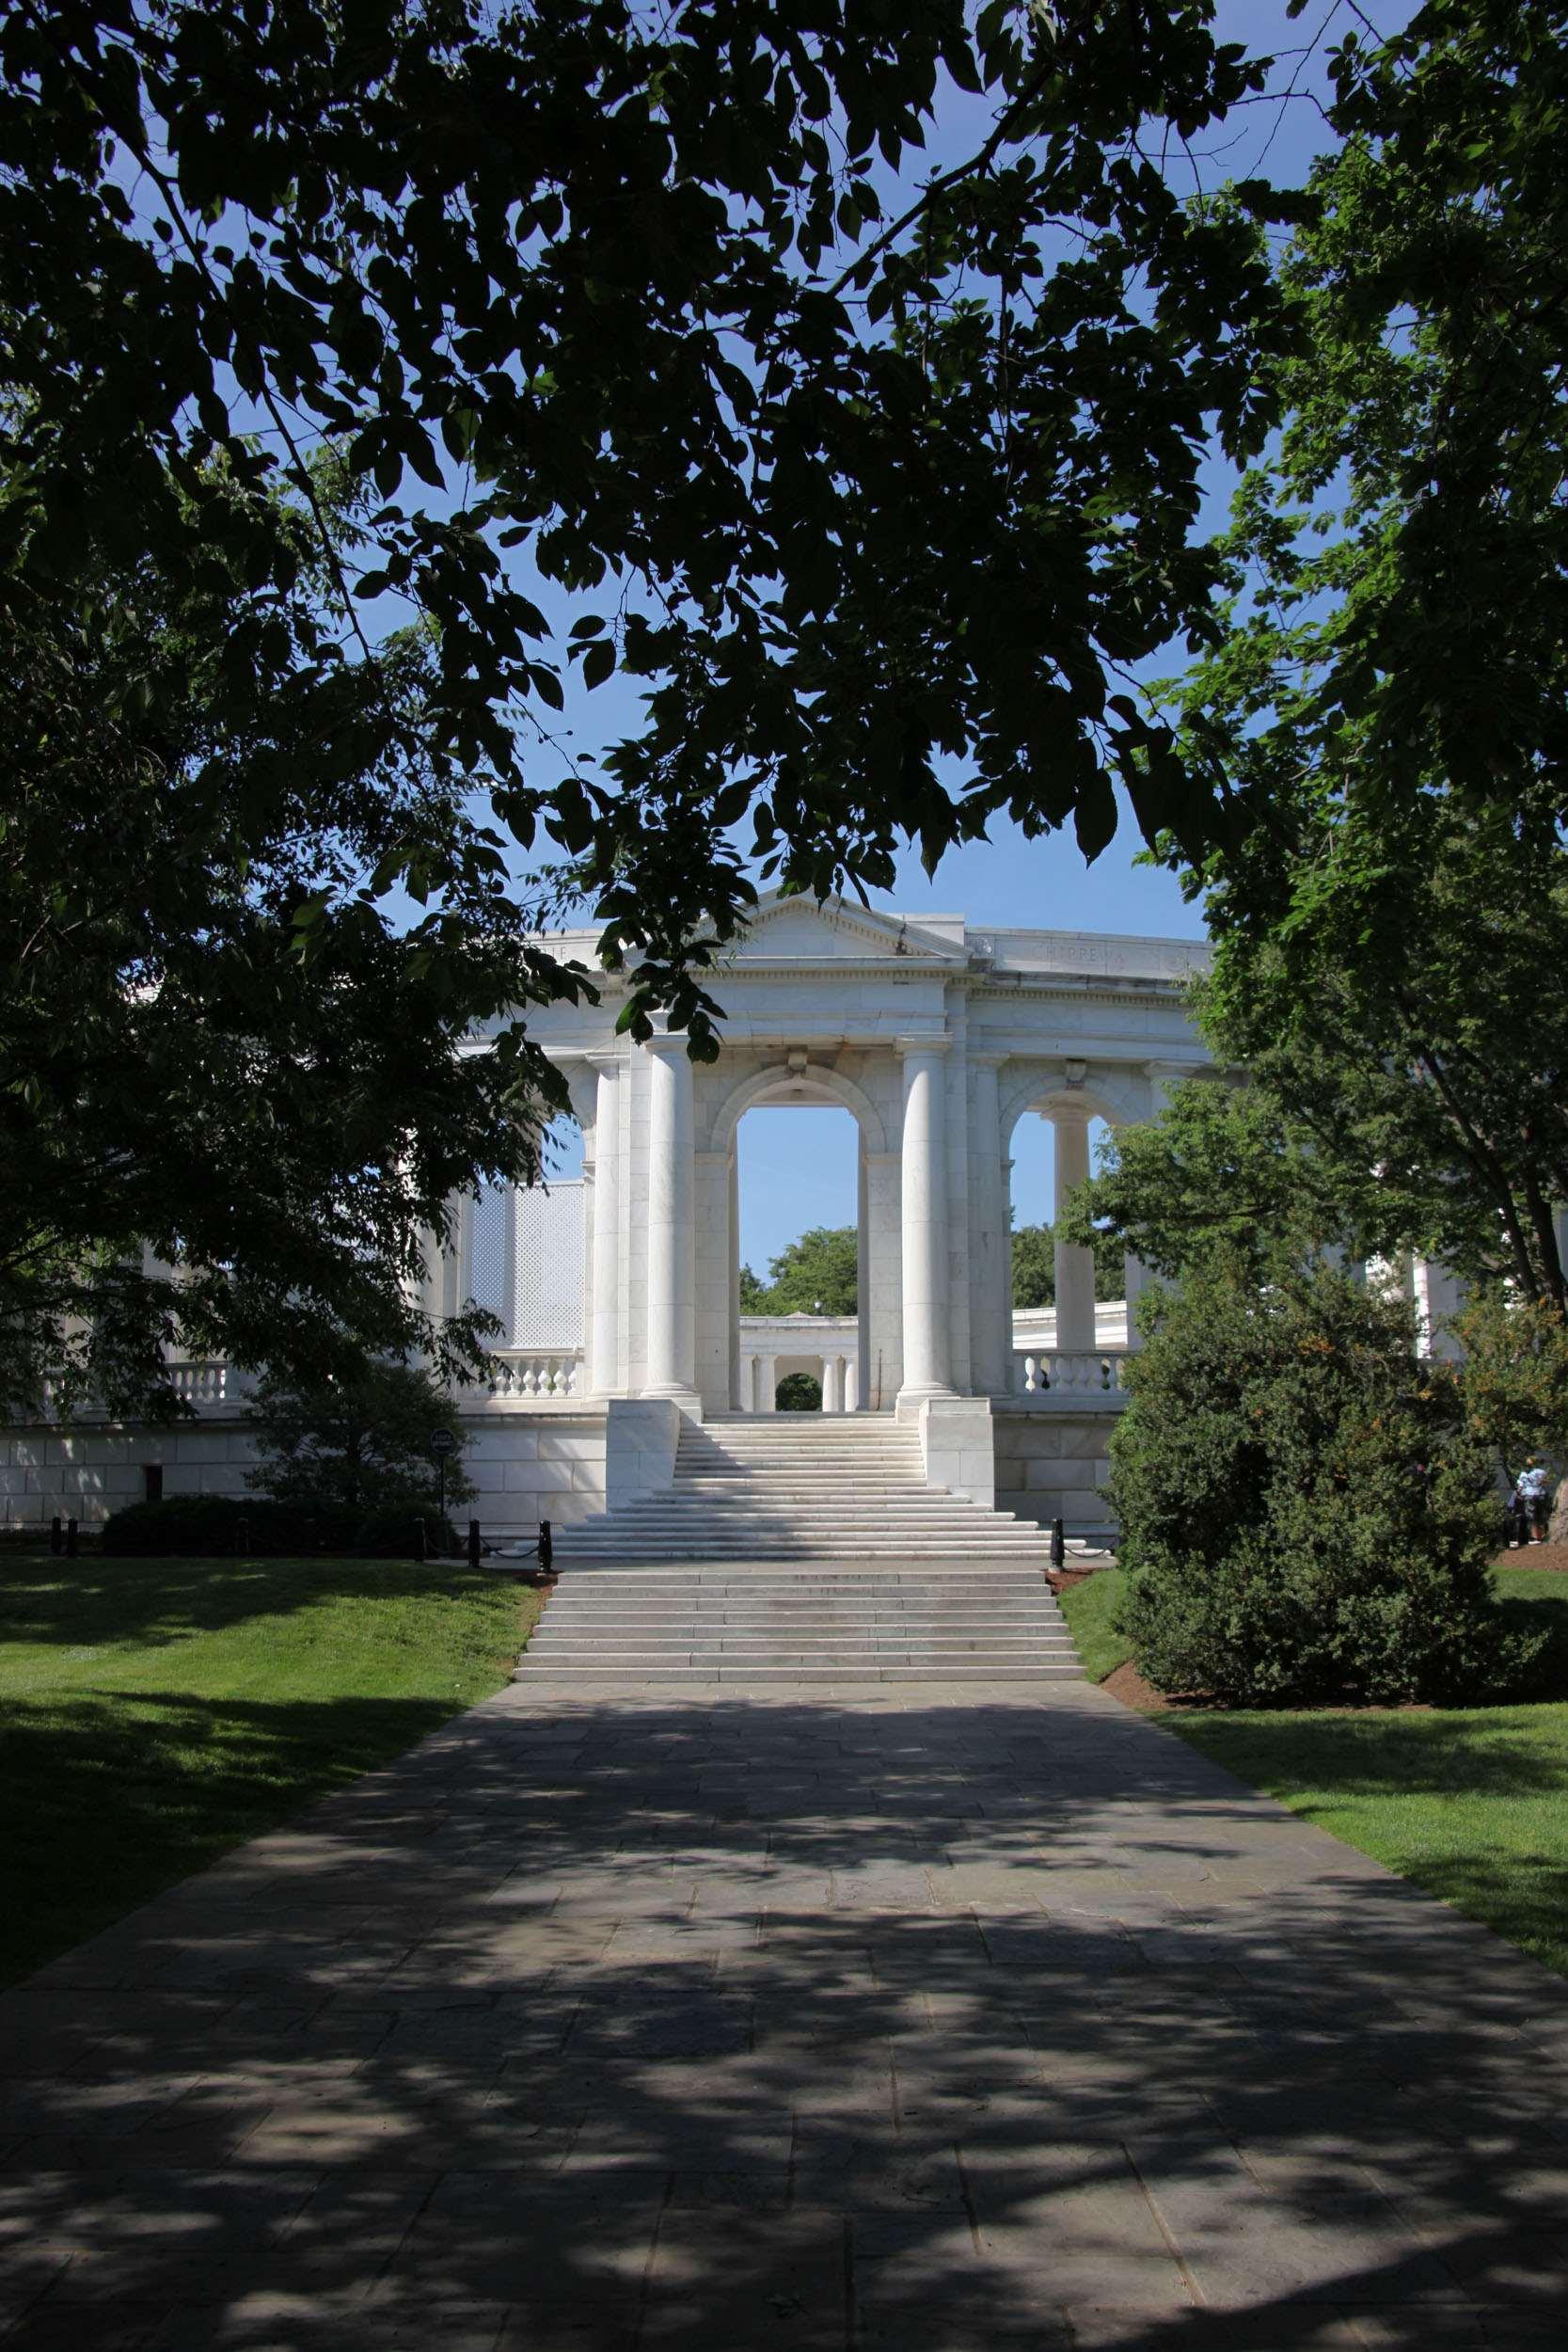 memorial amphitheater5 The Memorial Amphitheater at Arlington National Cemetery